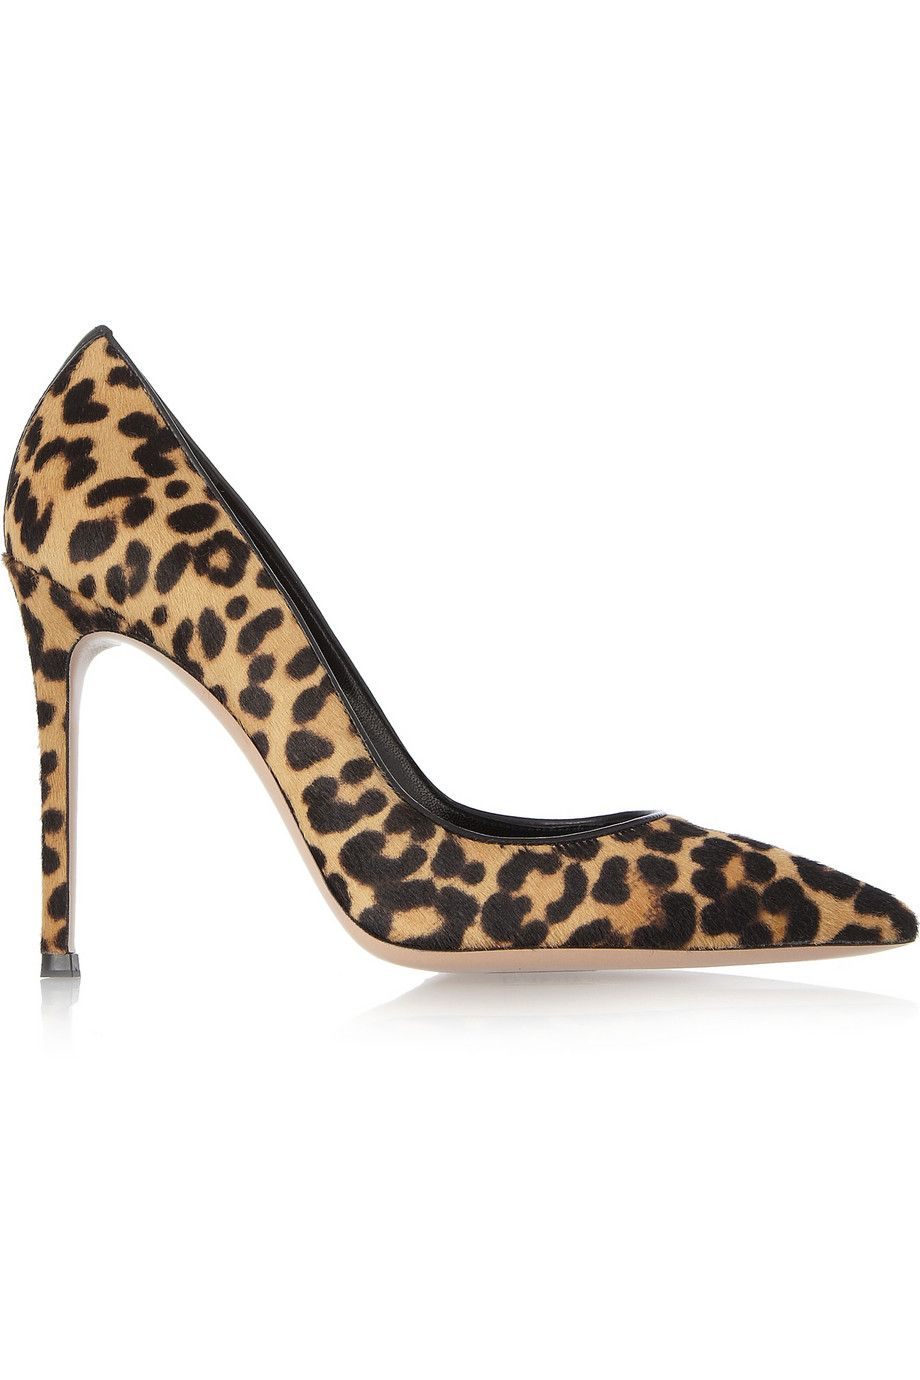 Leopard shoes, Leopard high heels